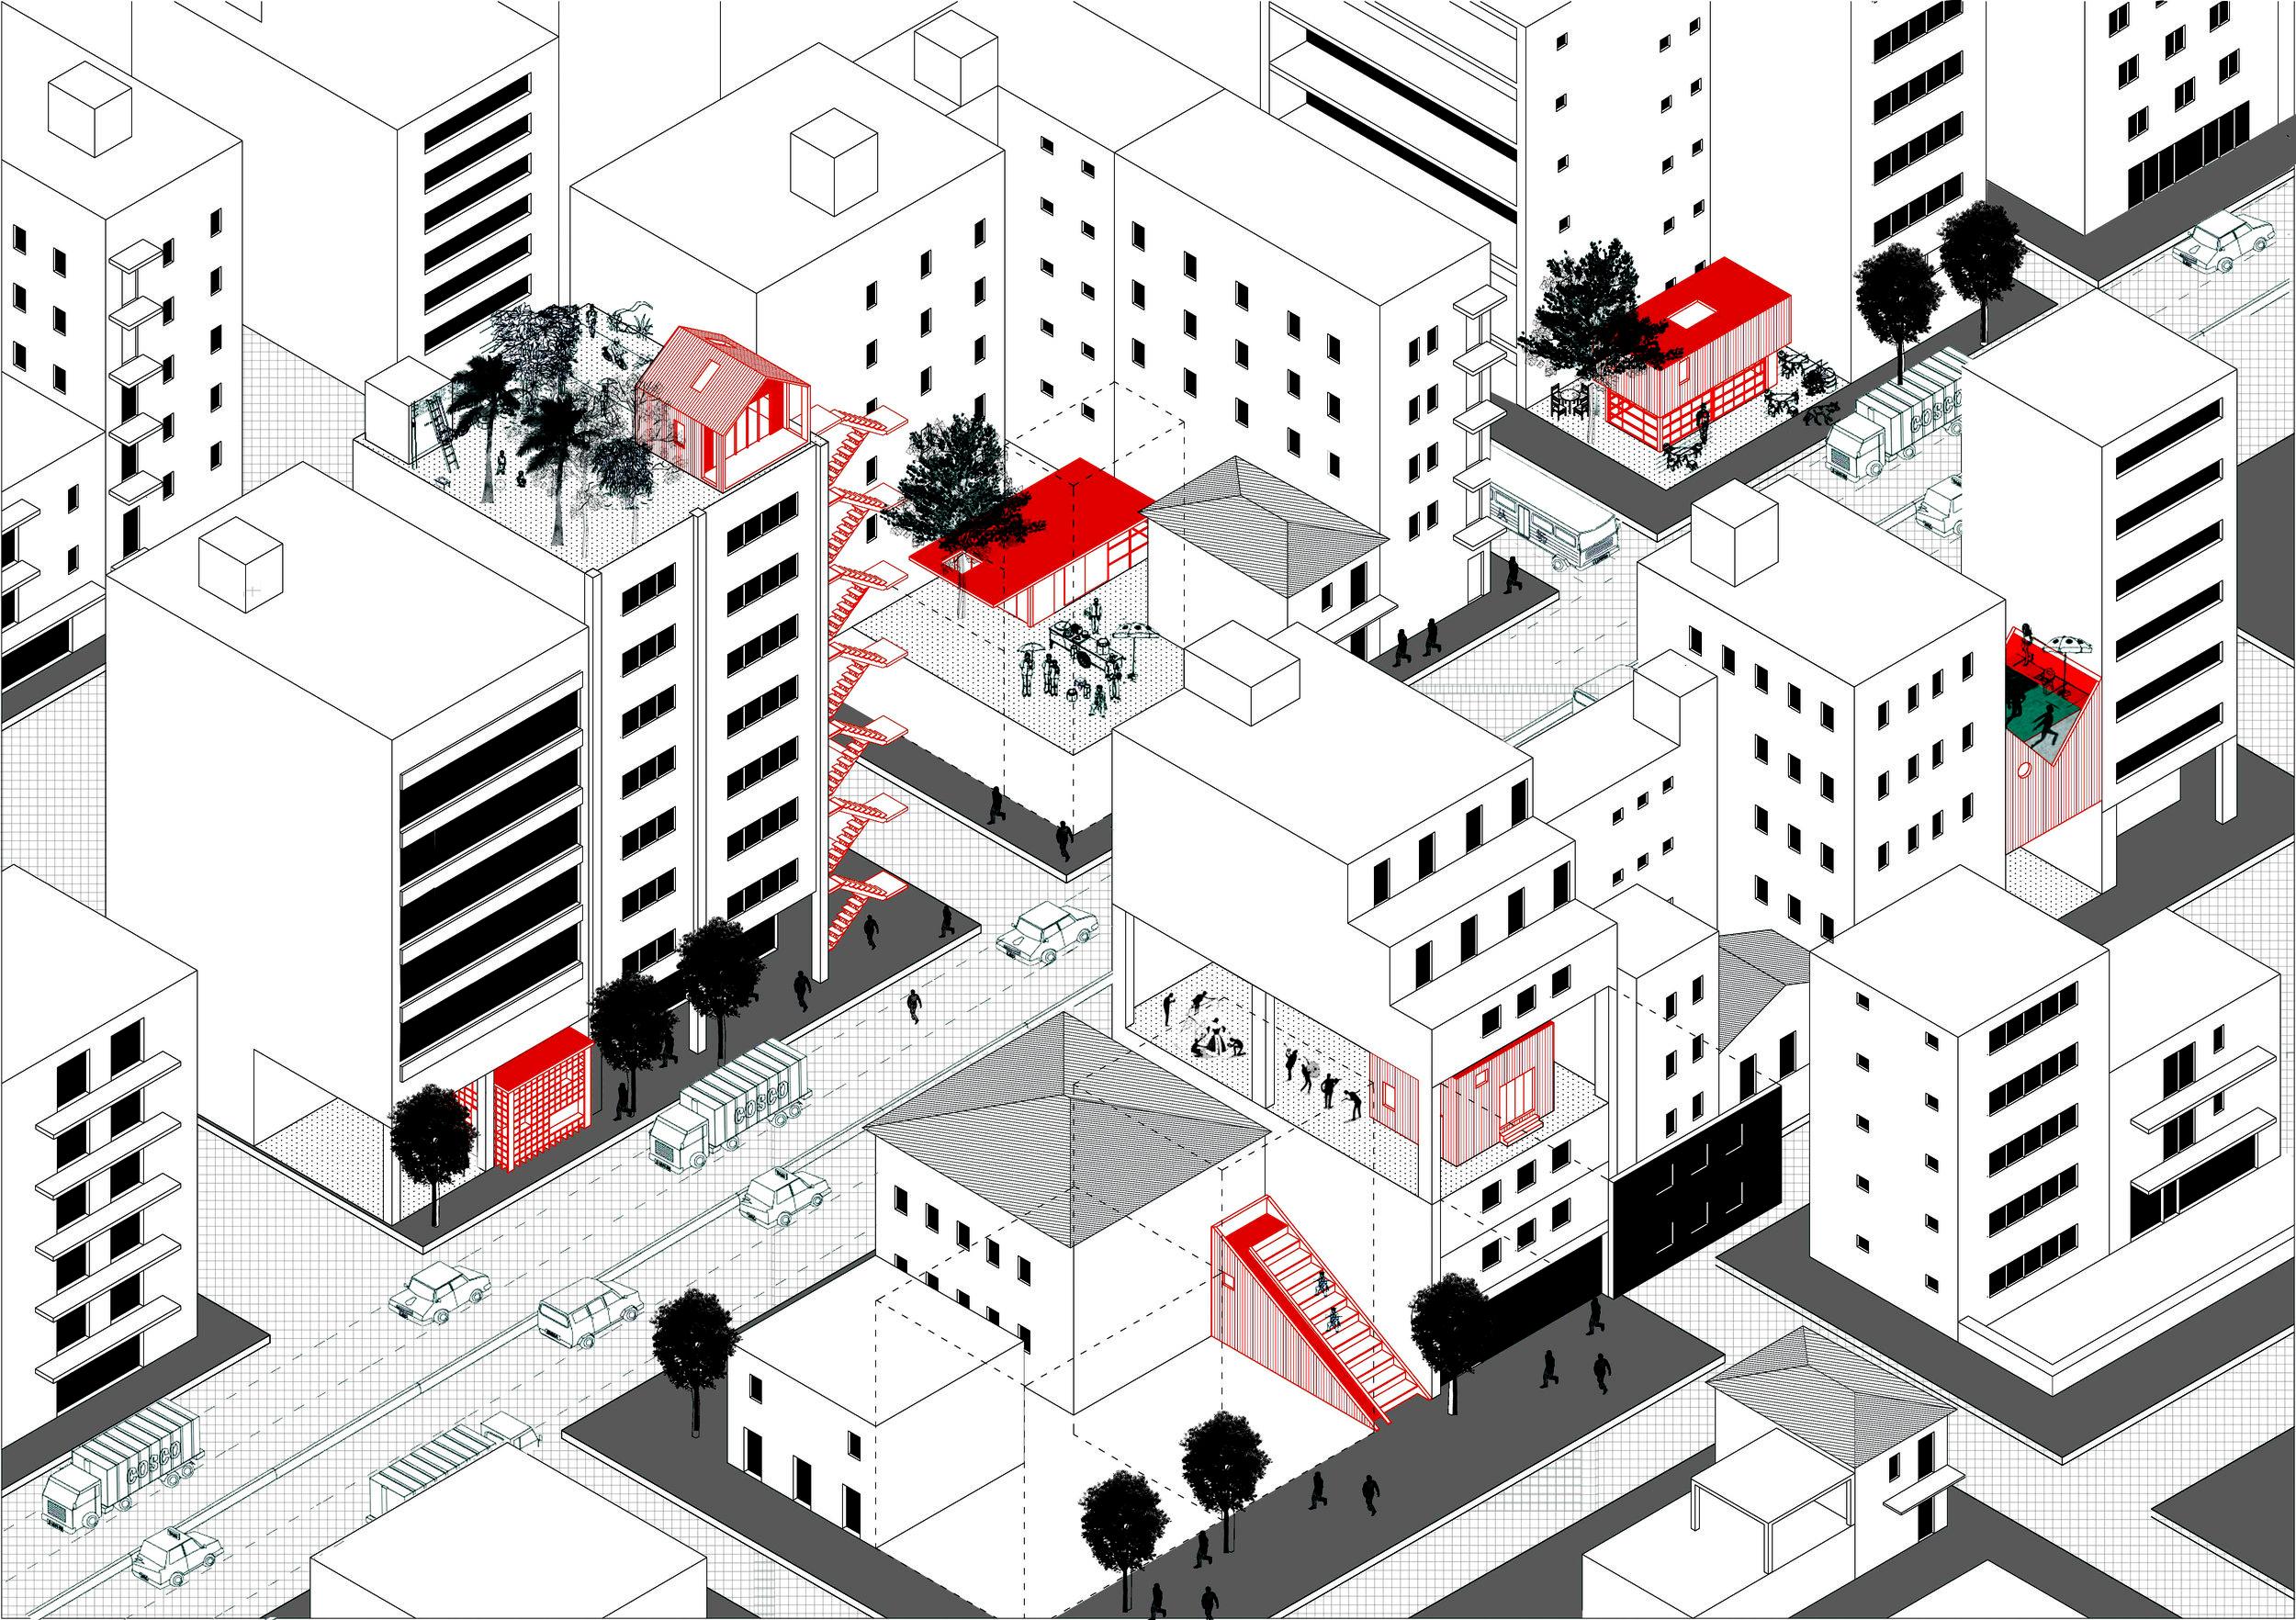 10.parasites in city.jpg